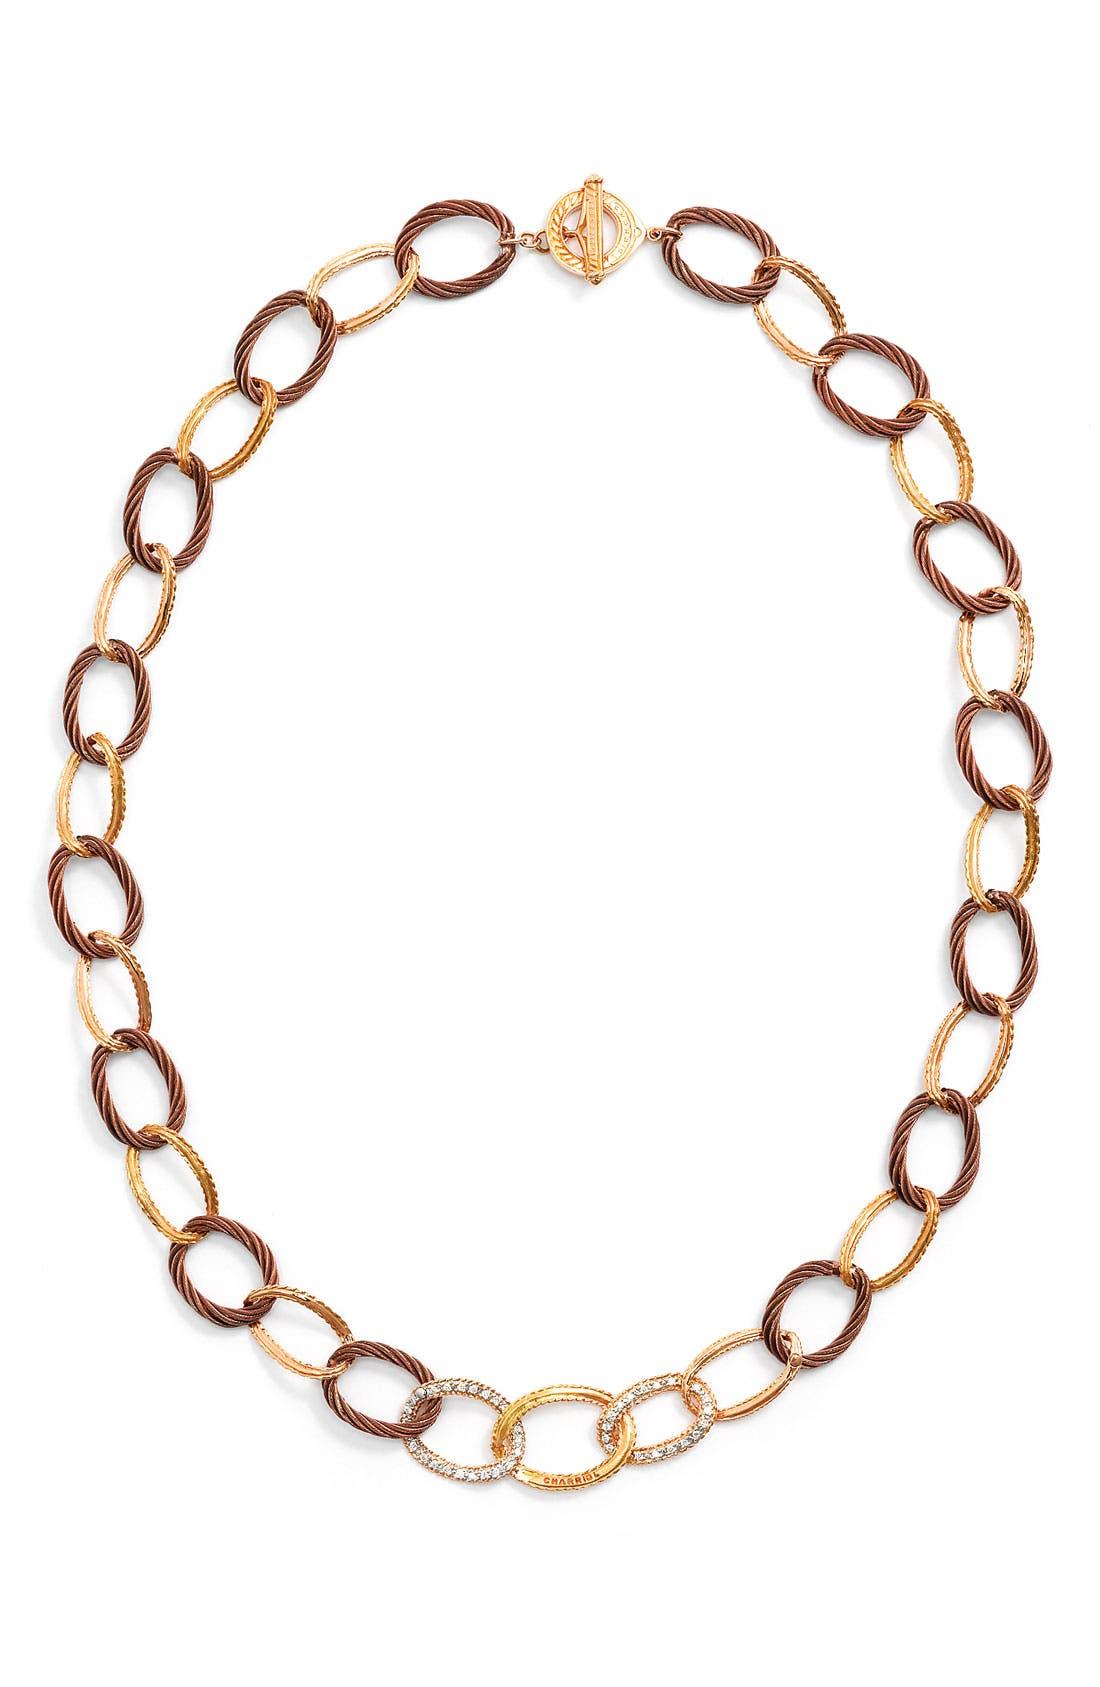 Main Image - ALOR® Gold, Diamond & Bronze Necklace